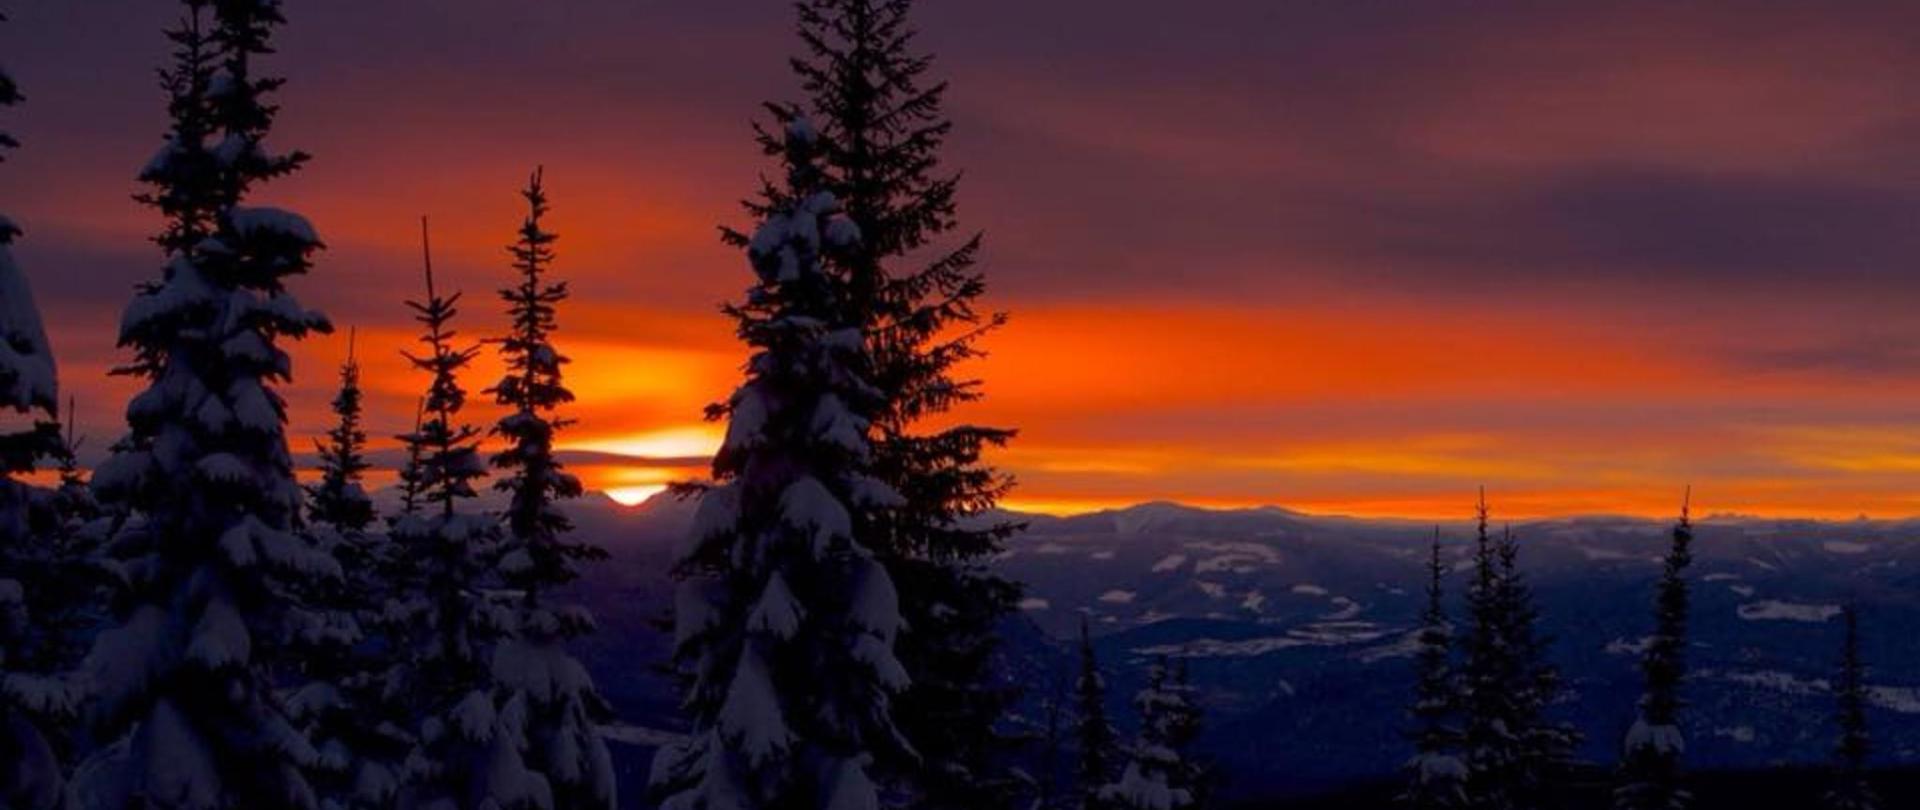 Sunrise at Silver Star.jpg